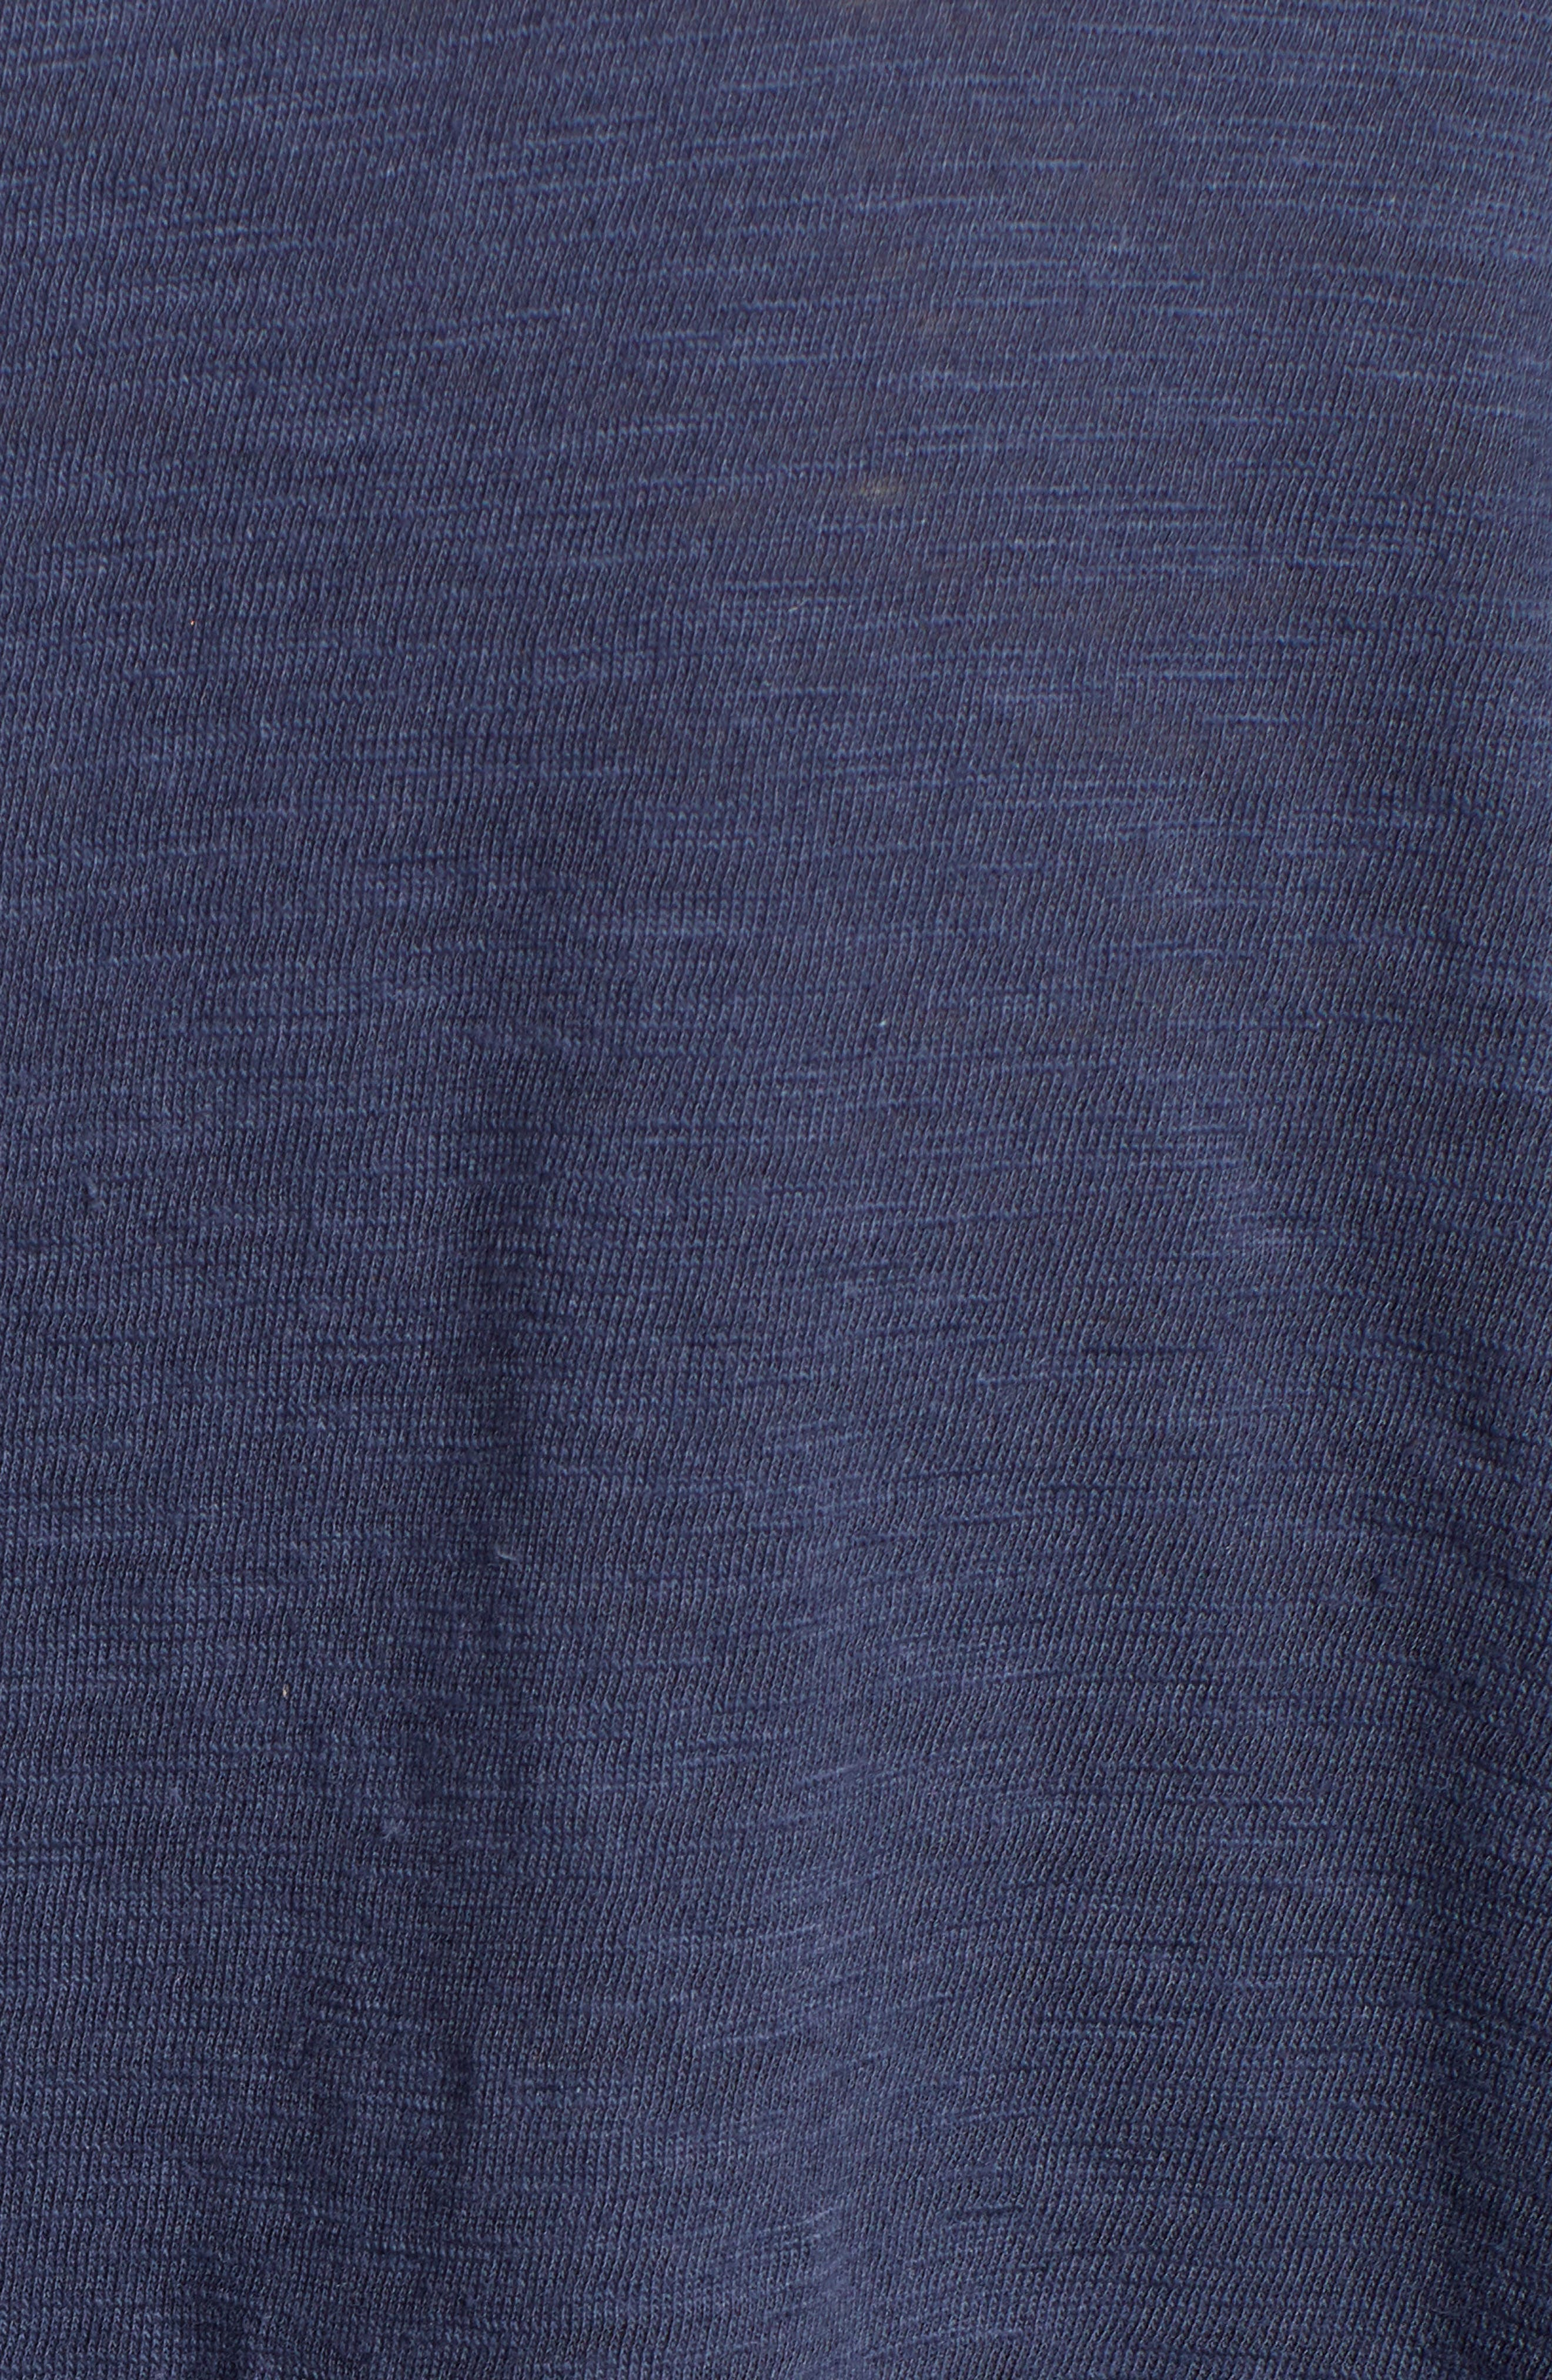 CASLON<SUP>®</SUP>, Off-Duty Dolman Sleeve Tee, Alternate thumbnail 5, color, NAVY PEACOAT